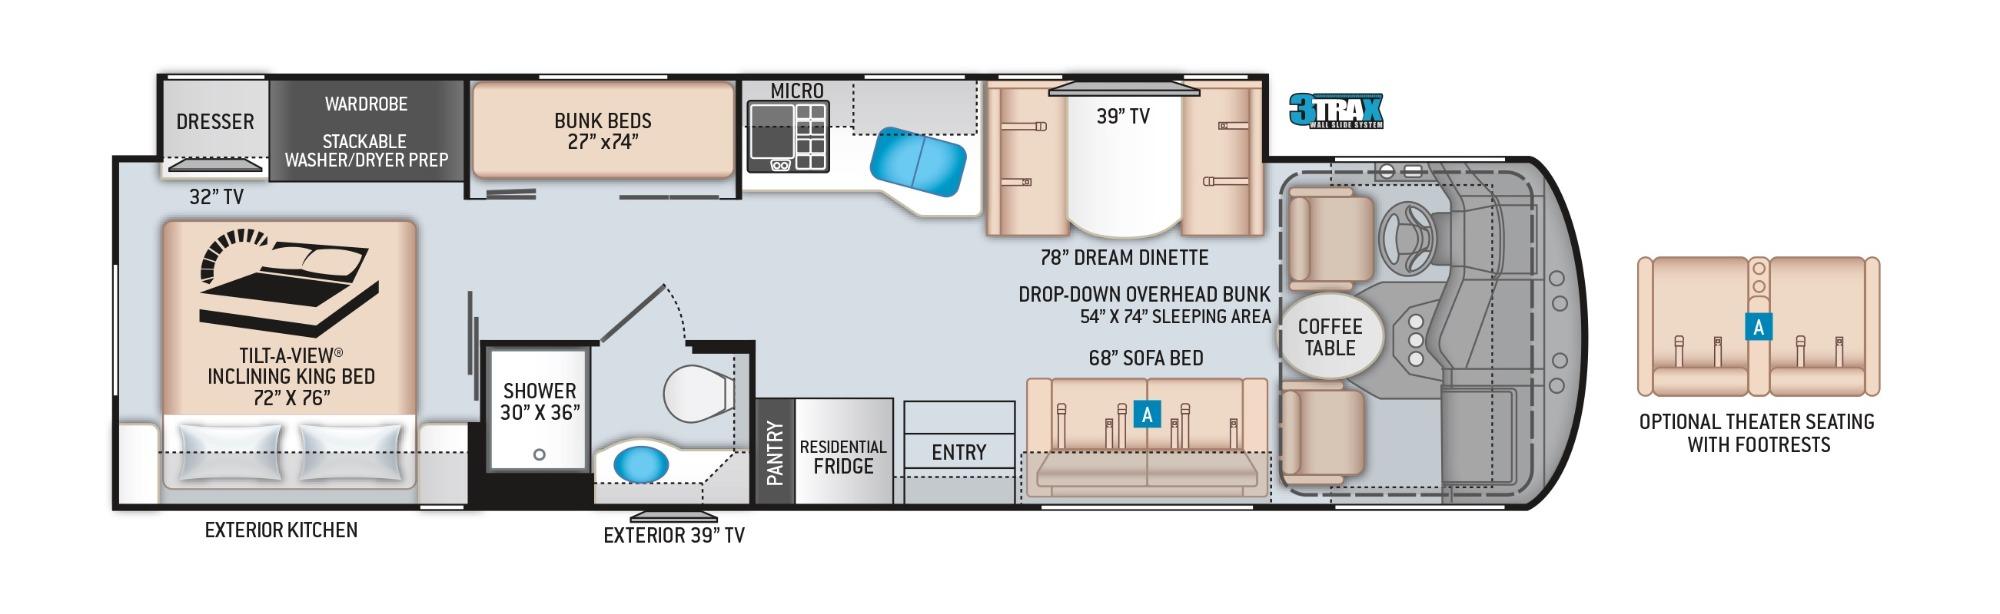 View Floor Plan for 2022 THOR MIRAMAR 34.6